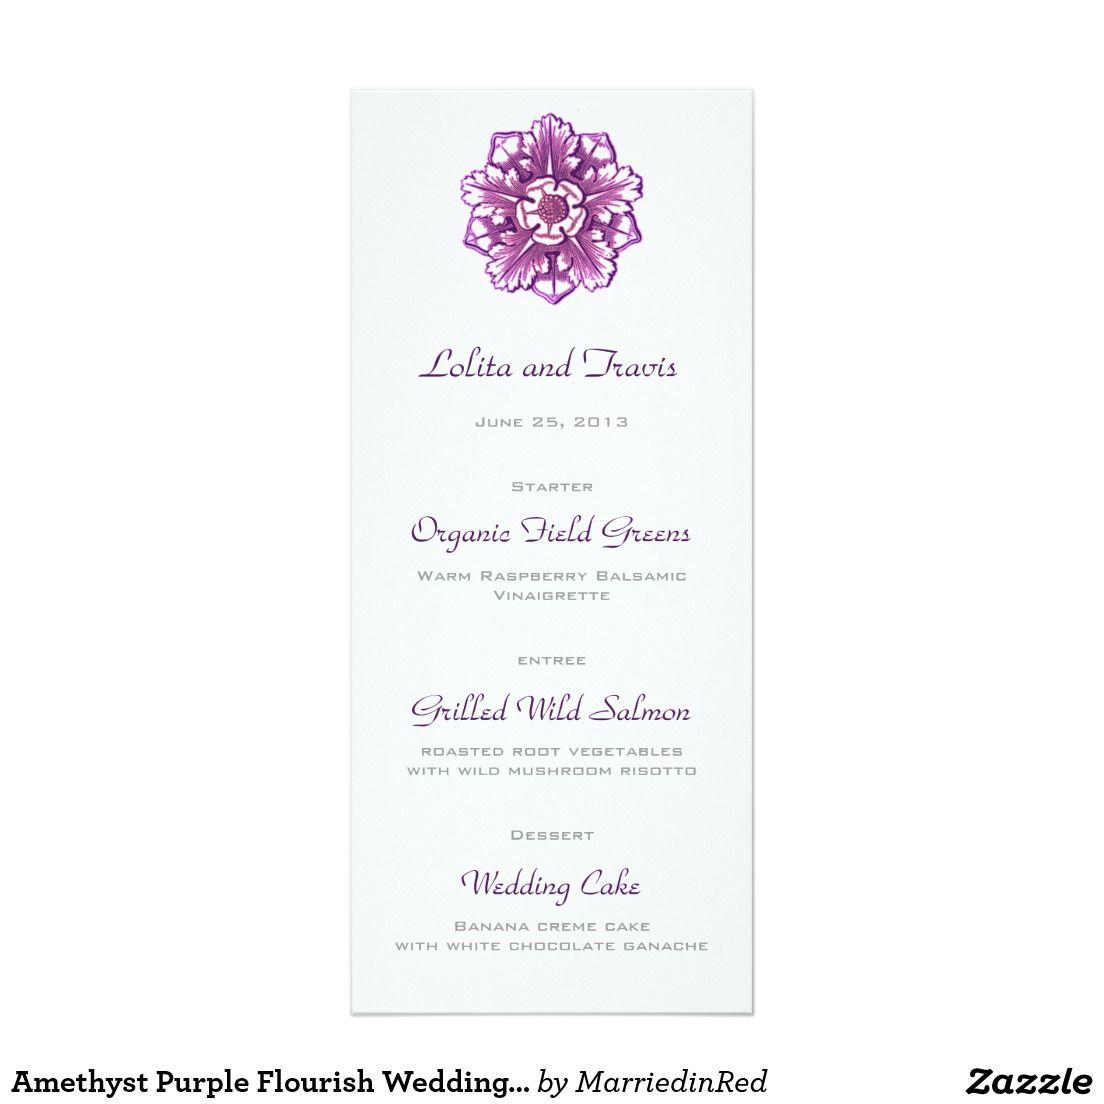 Amethyst Purple Flourish Wedding Menu Card | PSO Events | Pinterest ...